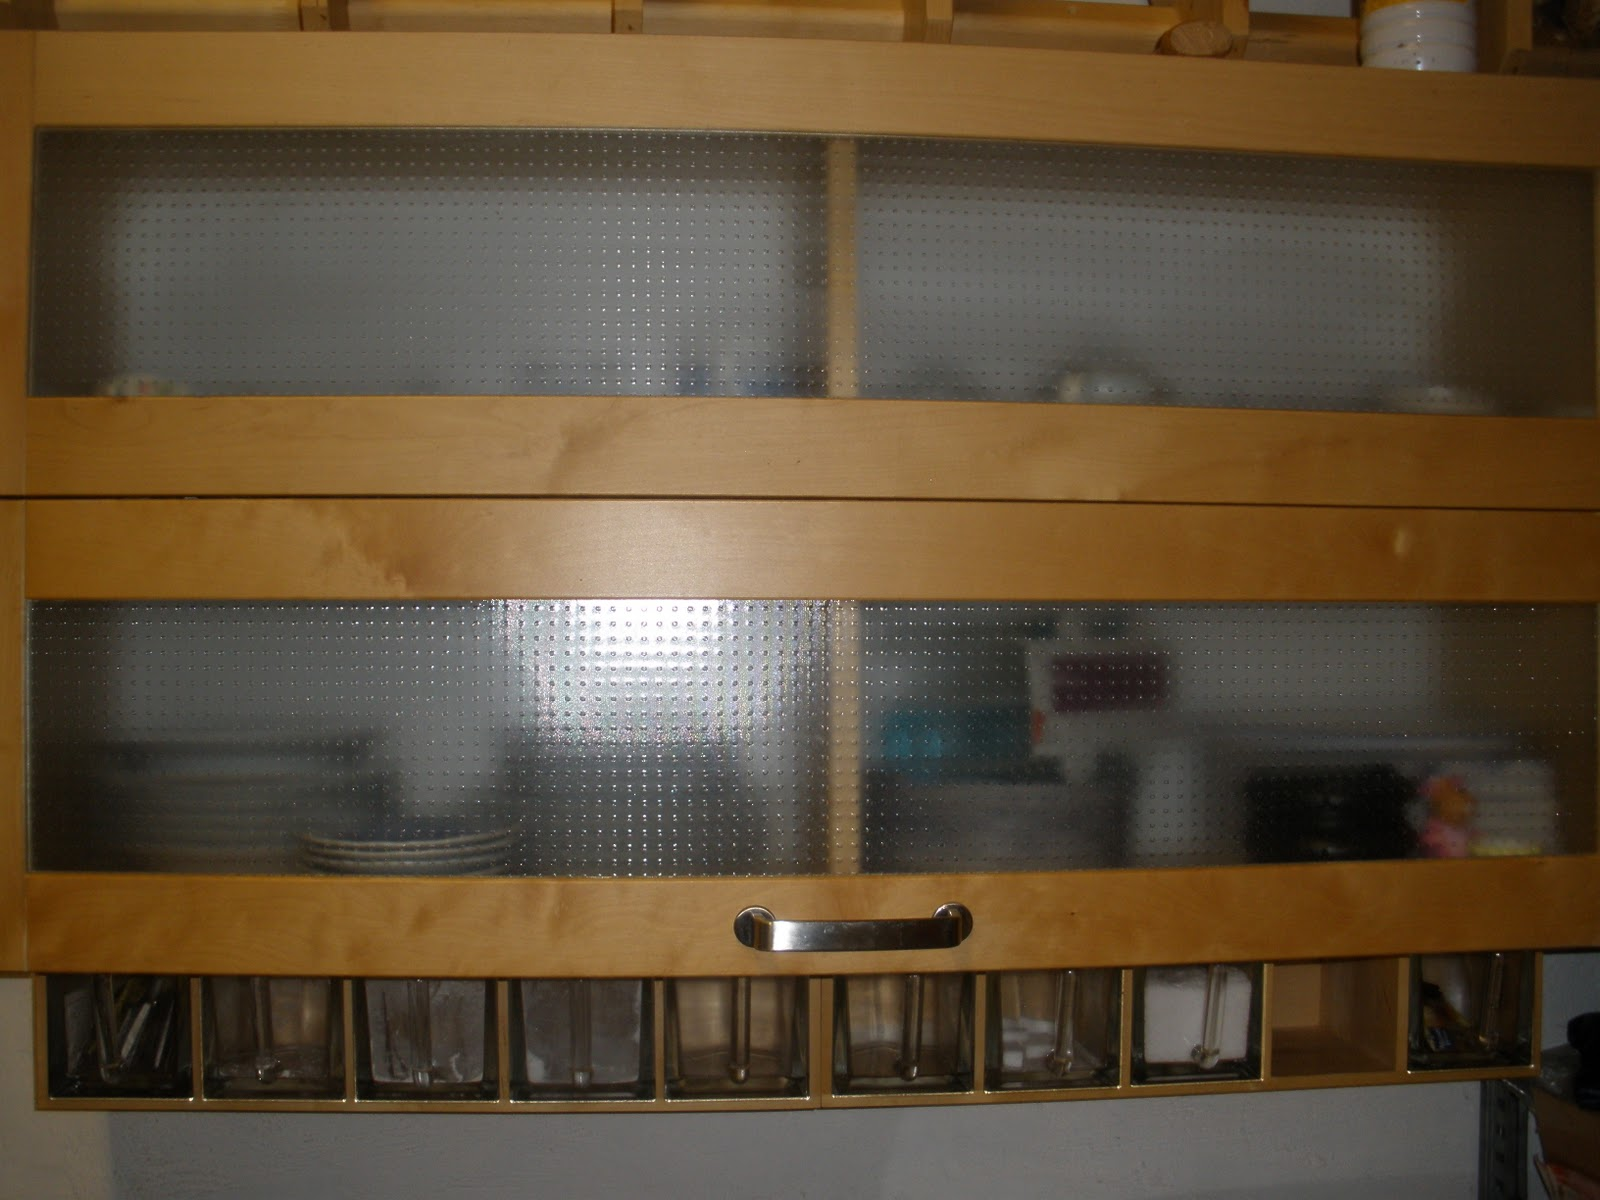 Le vide grenier la cuisine meubles electro m nager et for Ikea godmorgon meuble mural